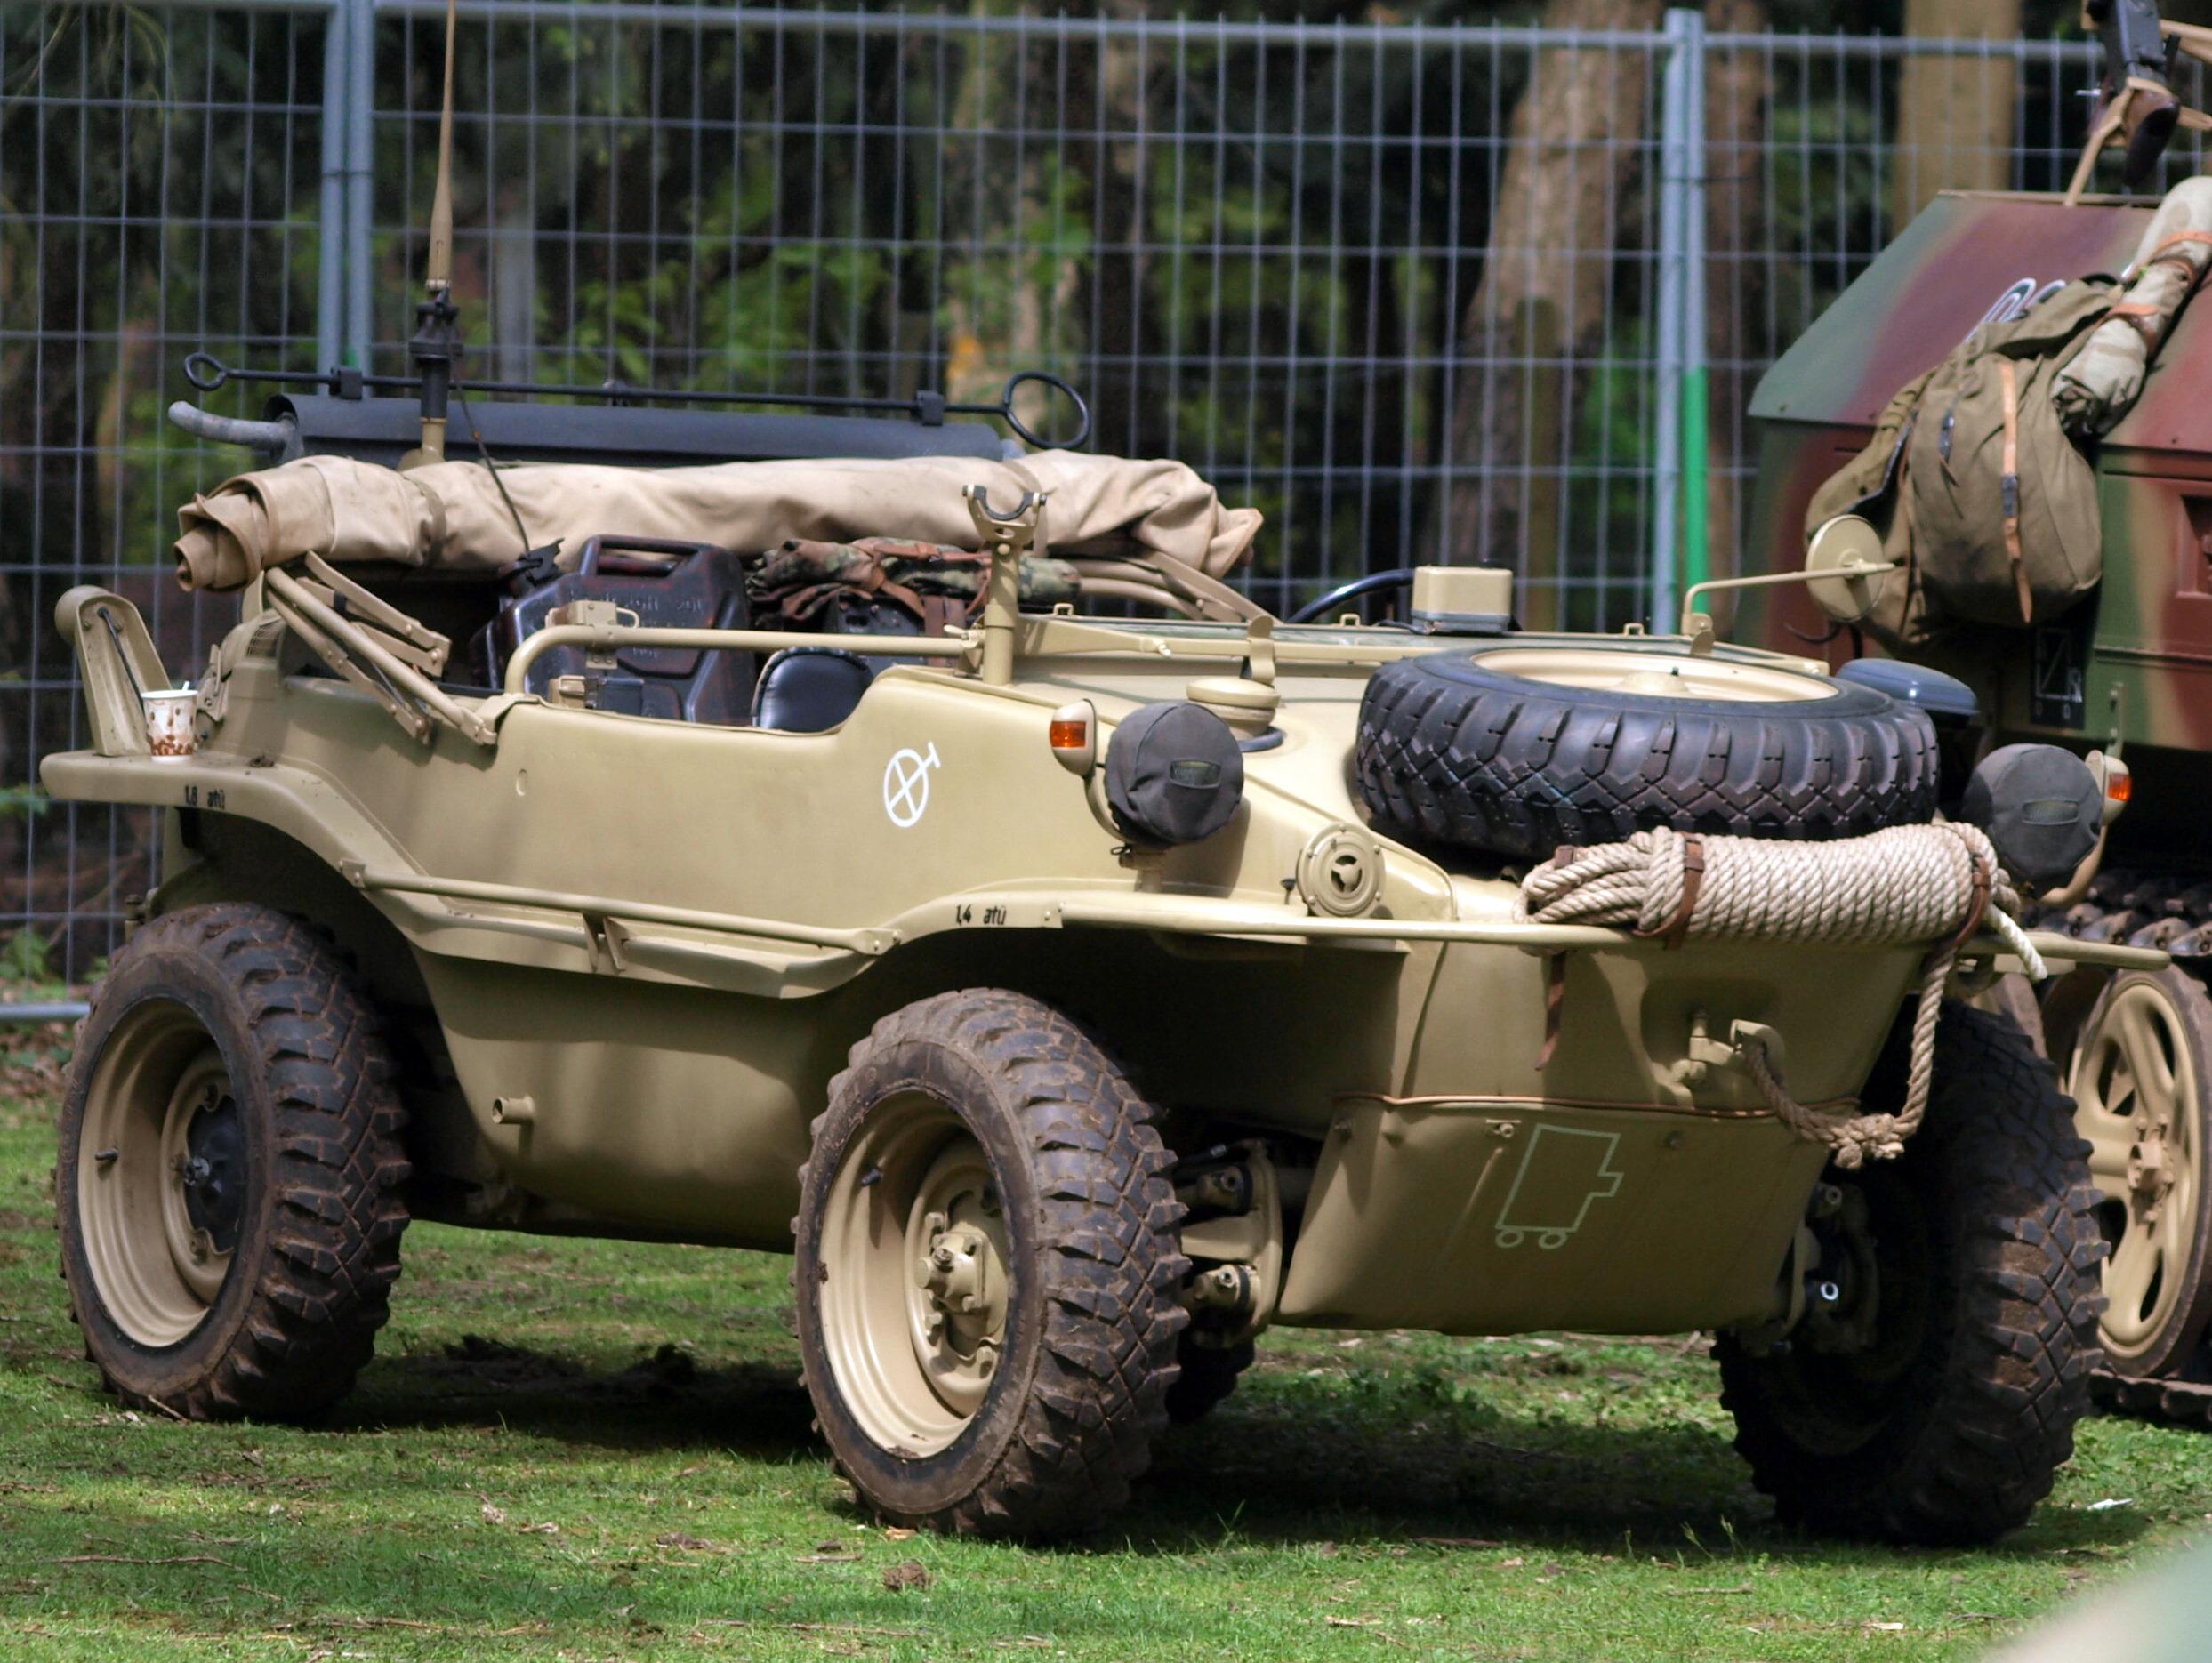 Amphibious Vehicle For Sale >> 1944 - VW-Schwimmwagen type 166 | Volkswagen, Army ...